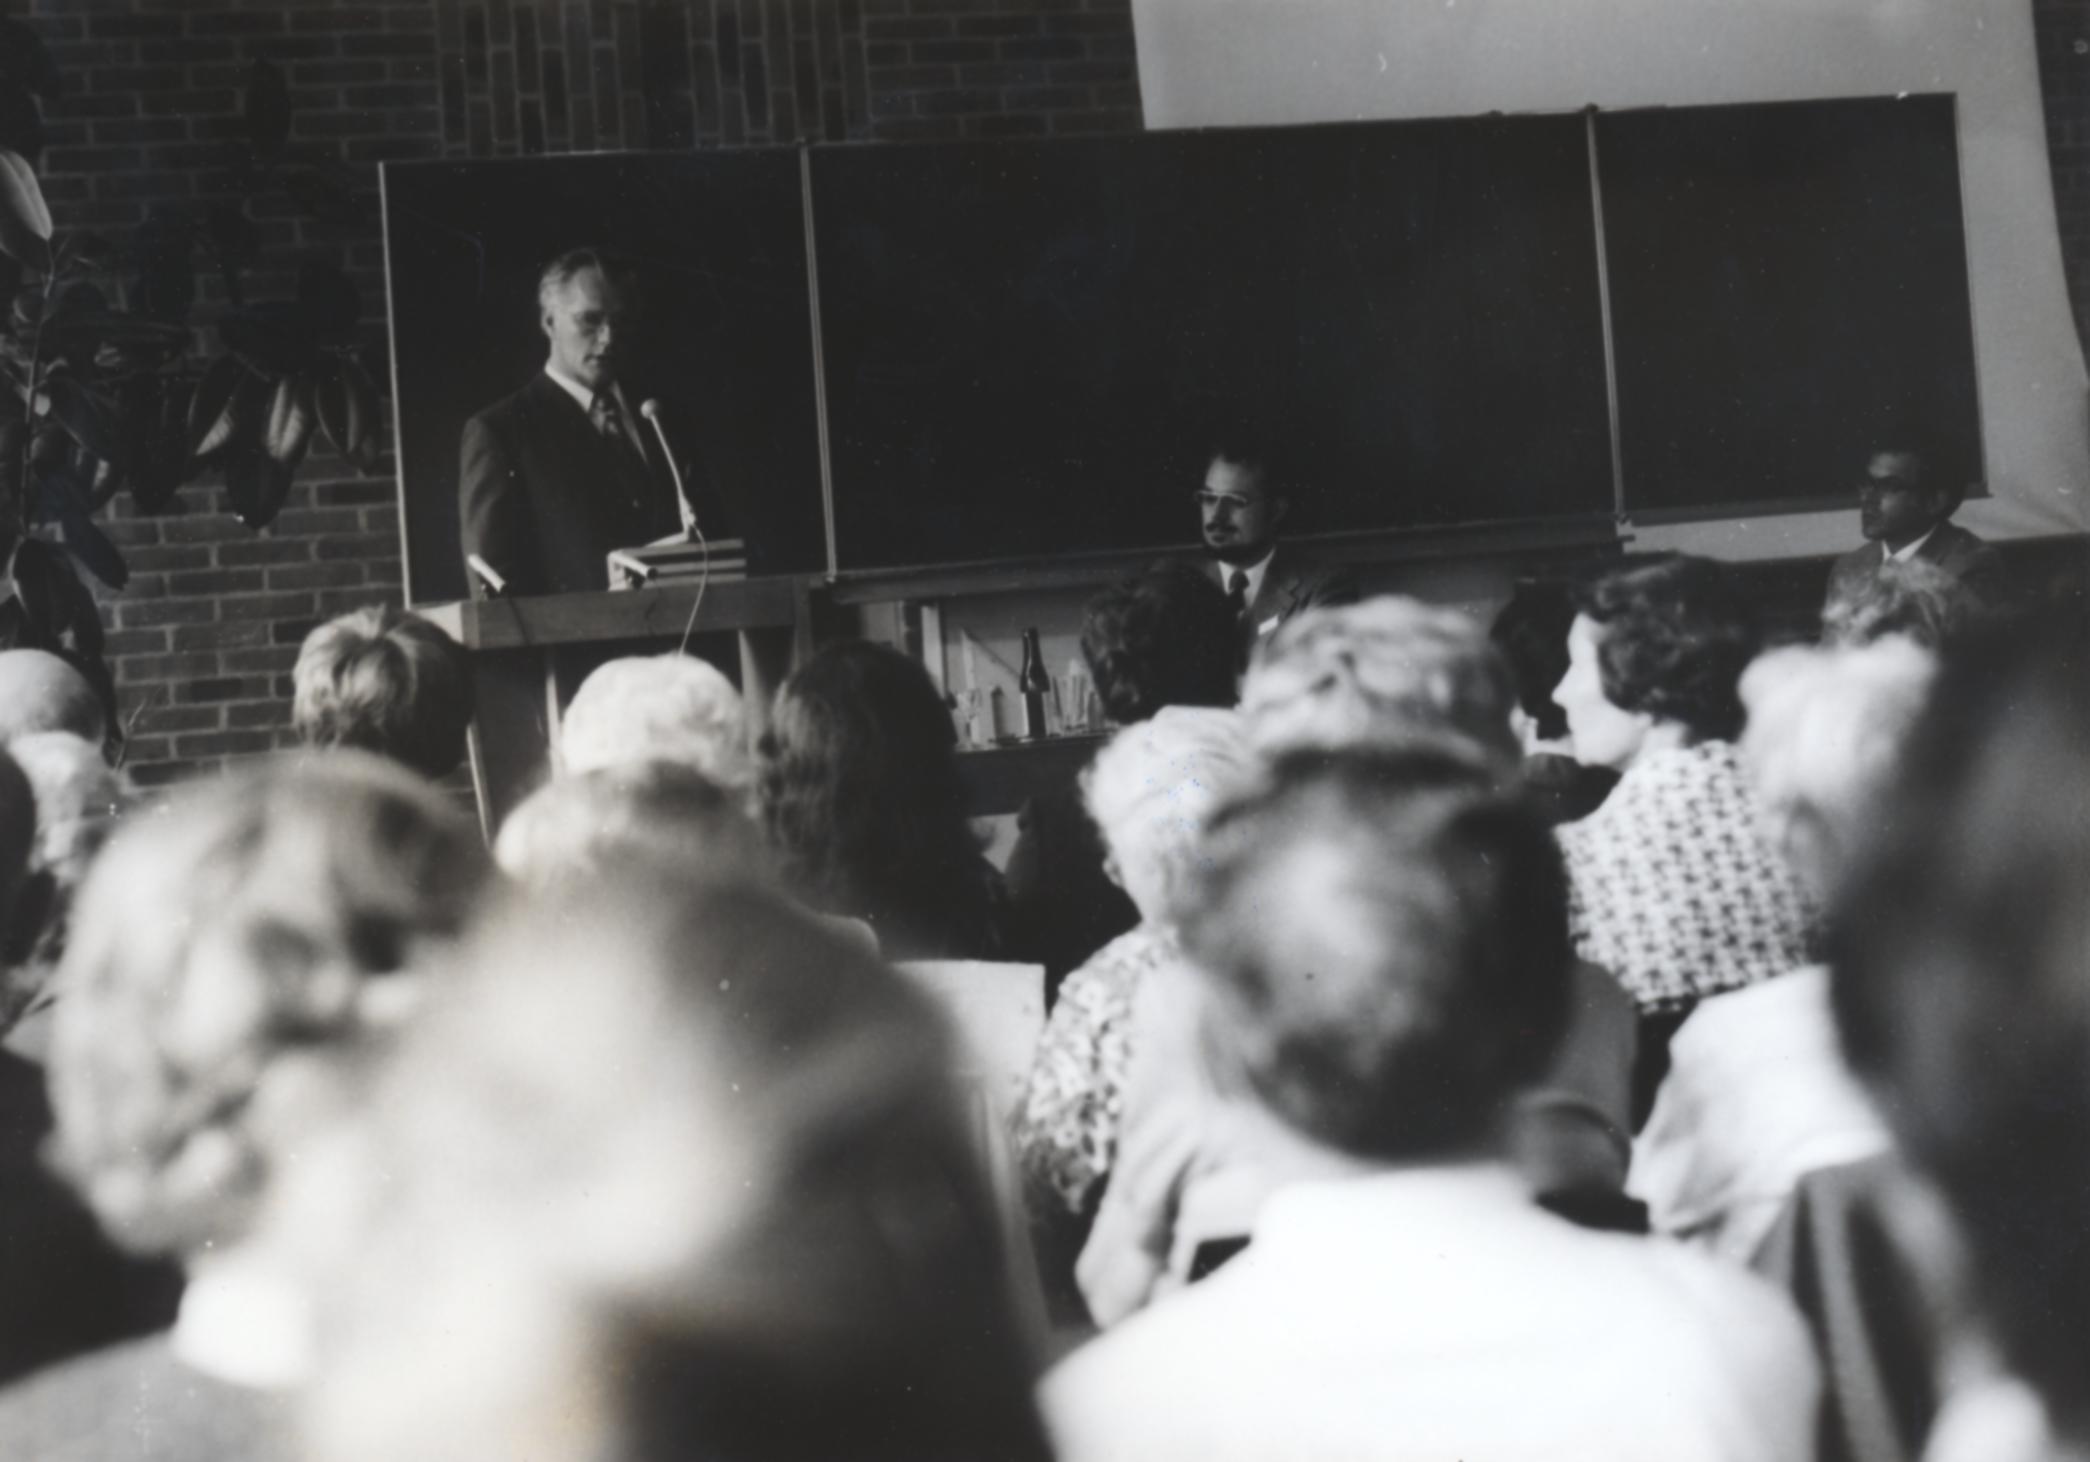 V. Internat. Imago Mundi-Kongress 1974, Cusanus Akademie, Brixen,links Dipl.Phys. Burkhard Heim, in der Mitte Illobrand von Ludwiger